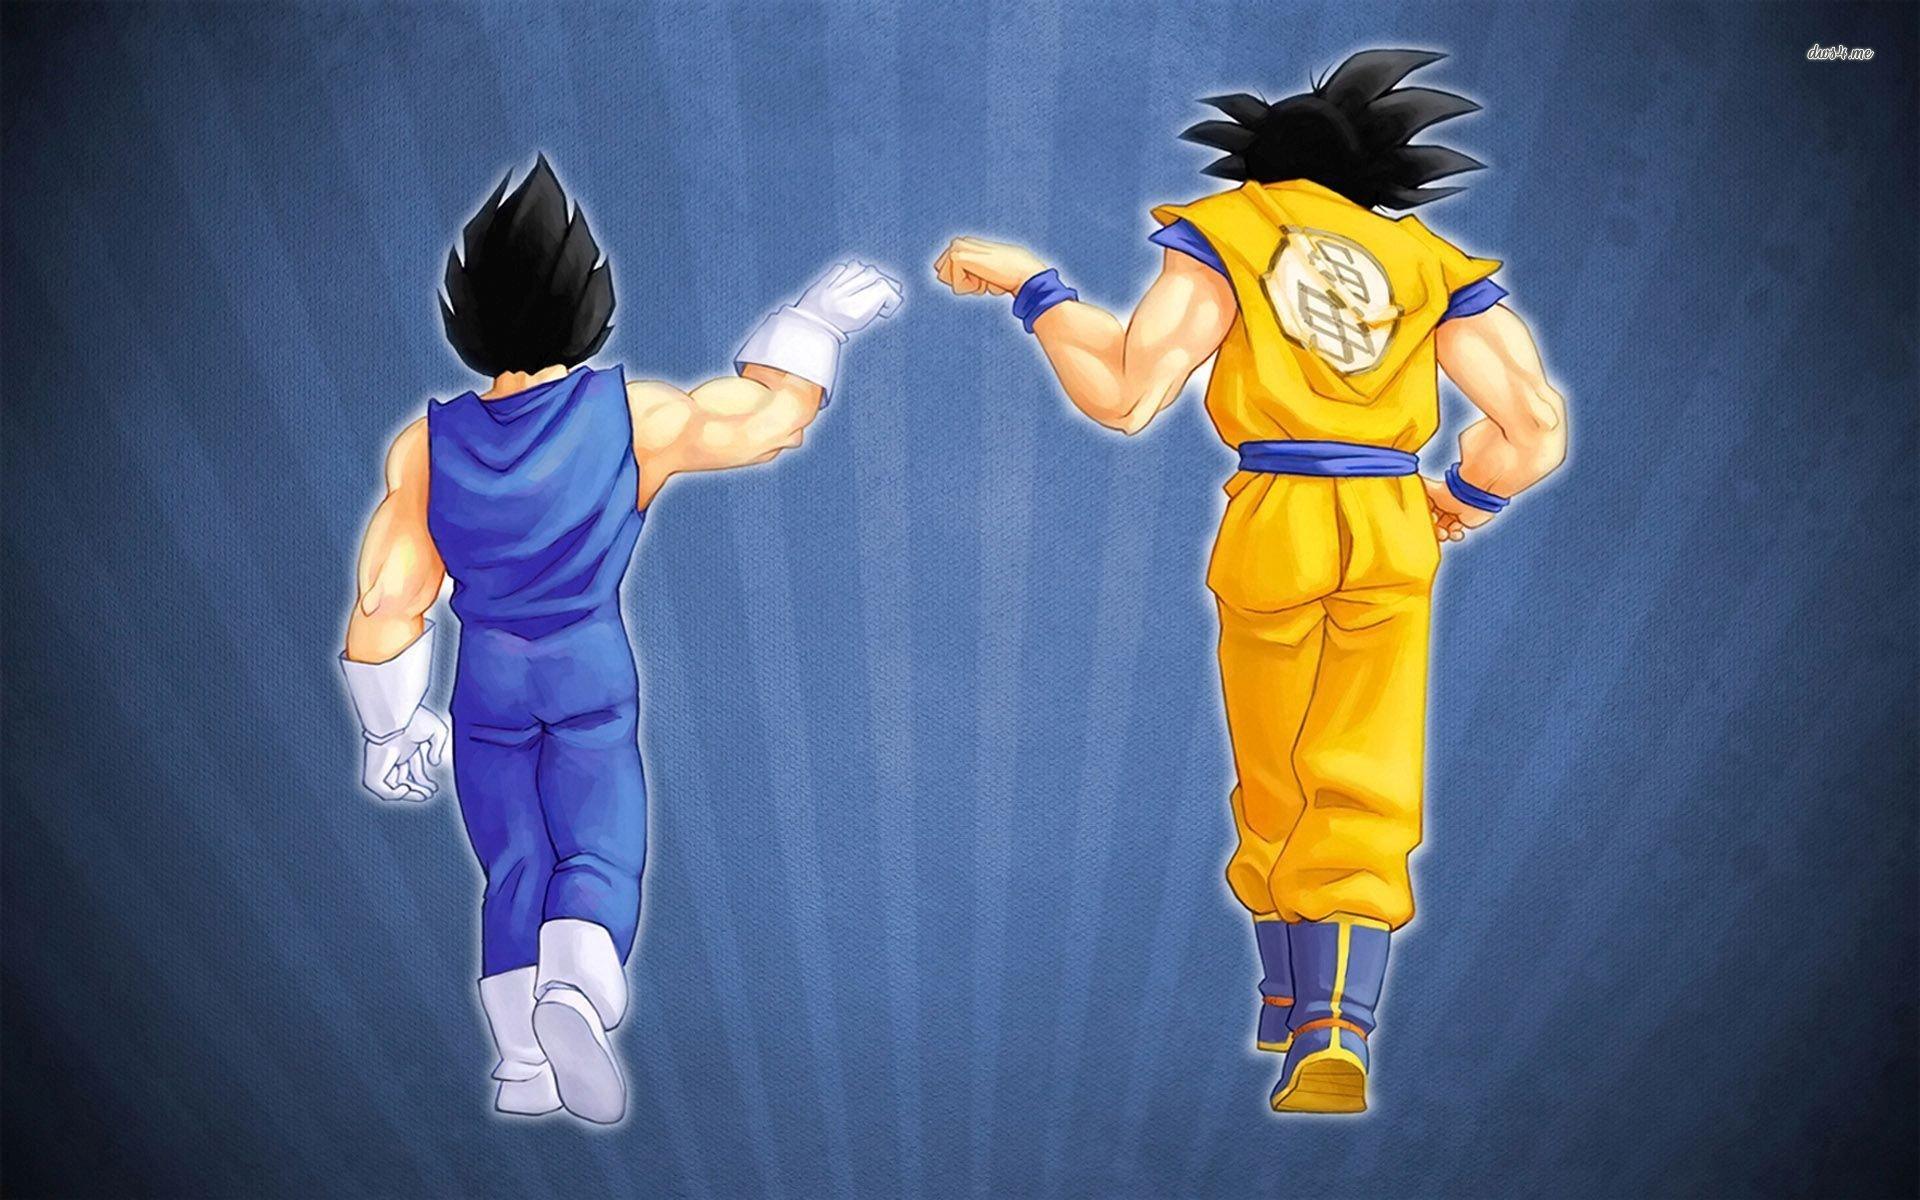 Goku And Vegeta Full Hd Fondo De Pantalla And Fondo De: Goku And Vegeta Fist Bump HD Wallpaper